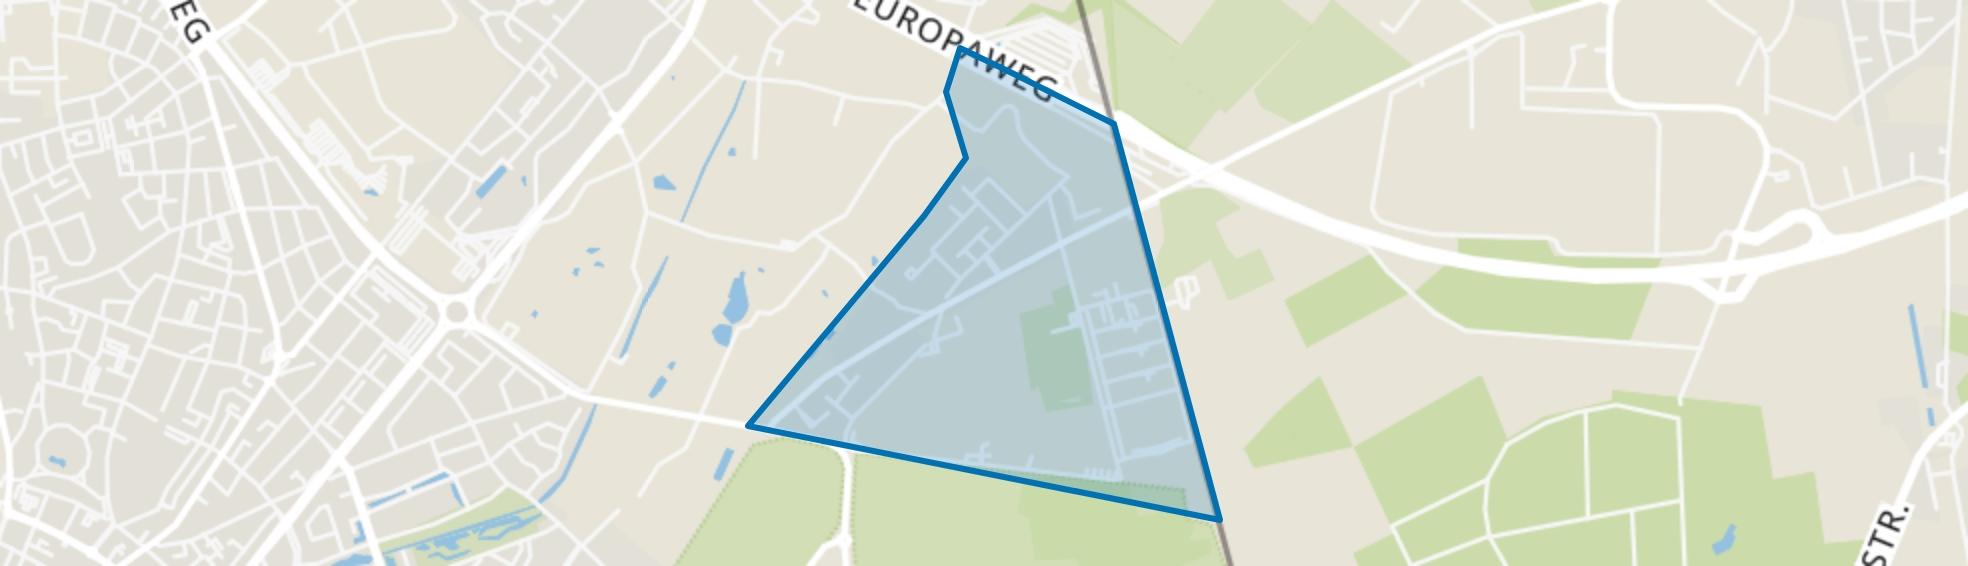 Herungerberg, Venlo map